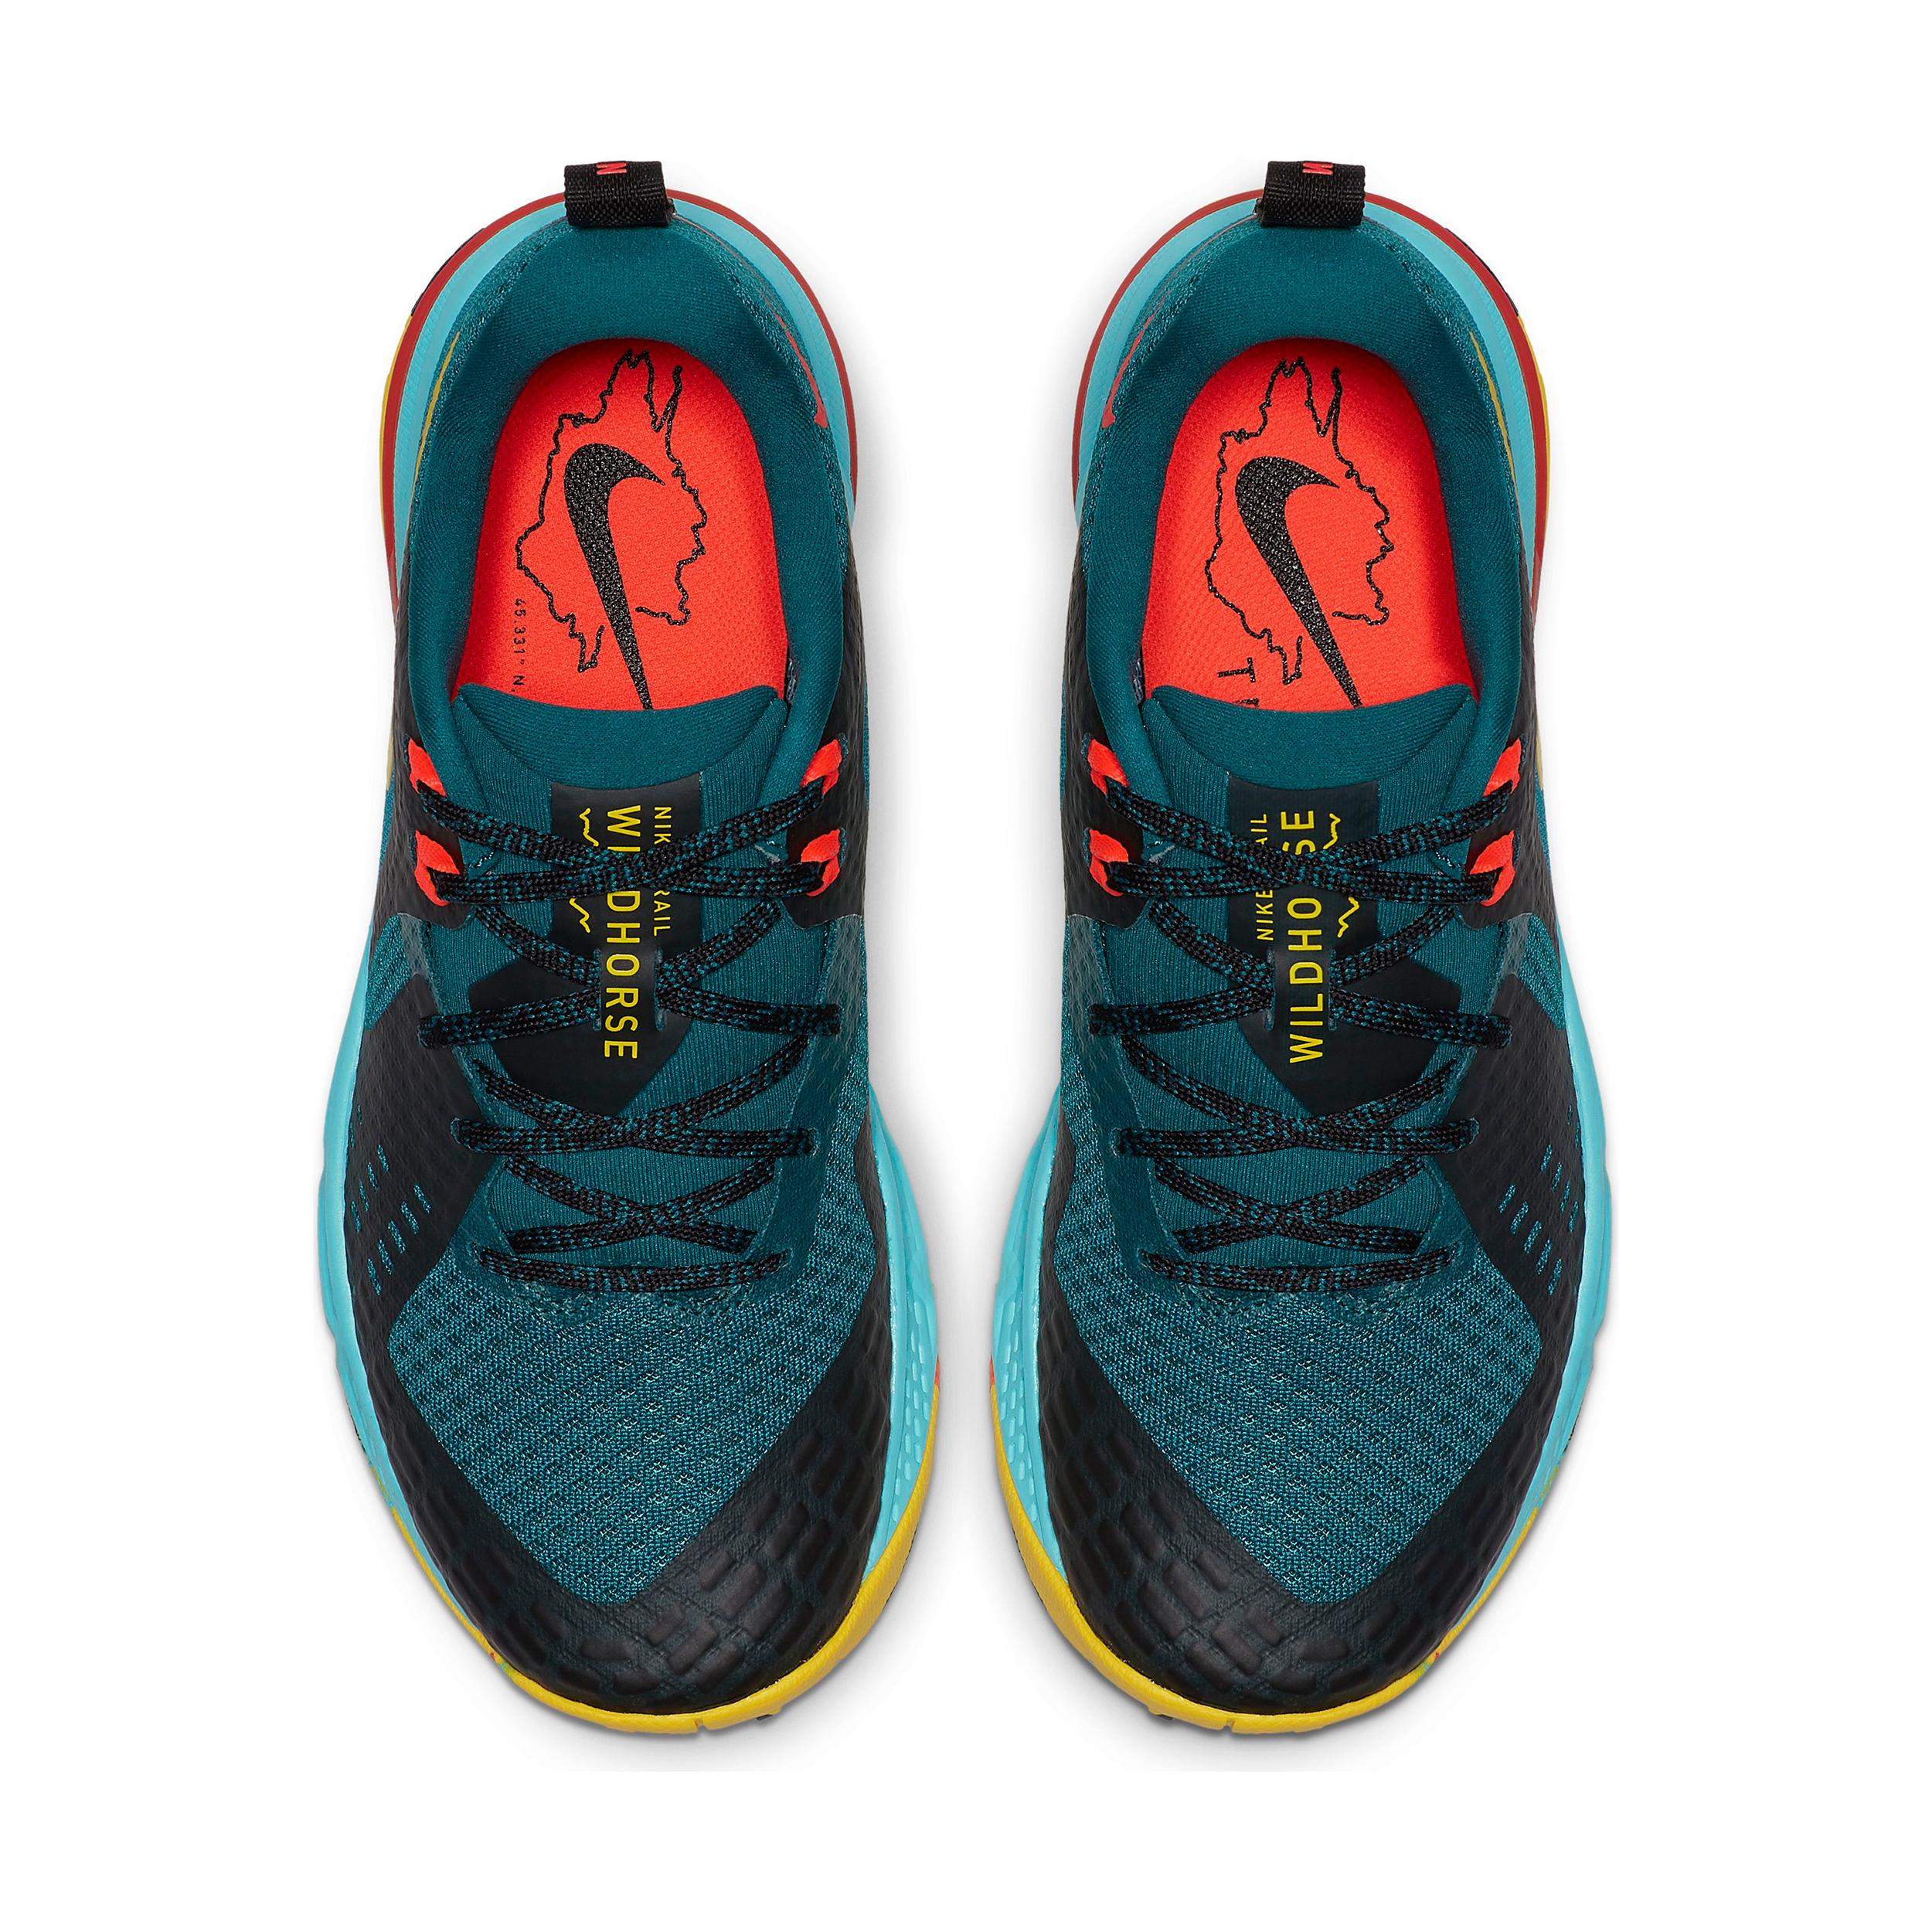 Nike Air Zoom Wildhorse 5 Trail Running